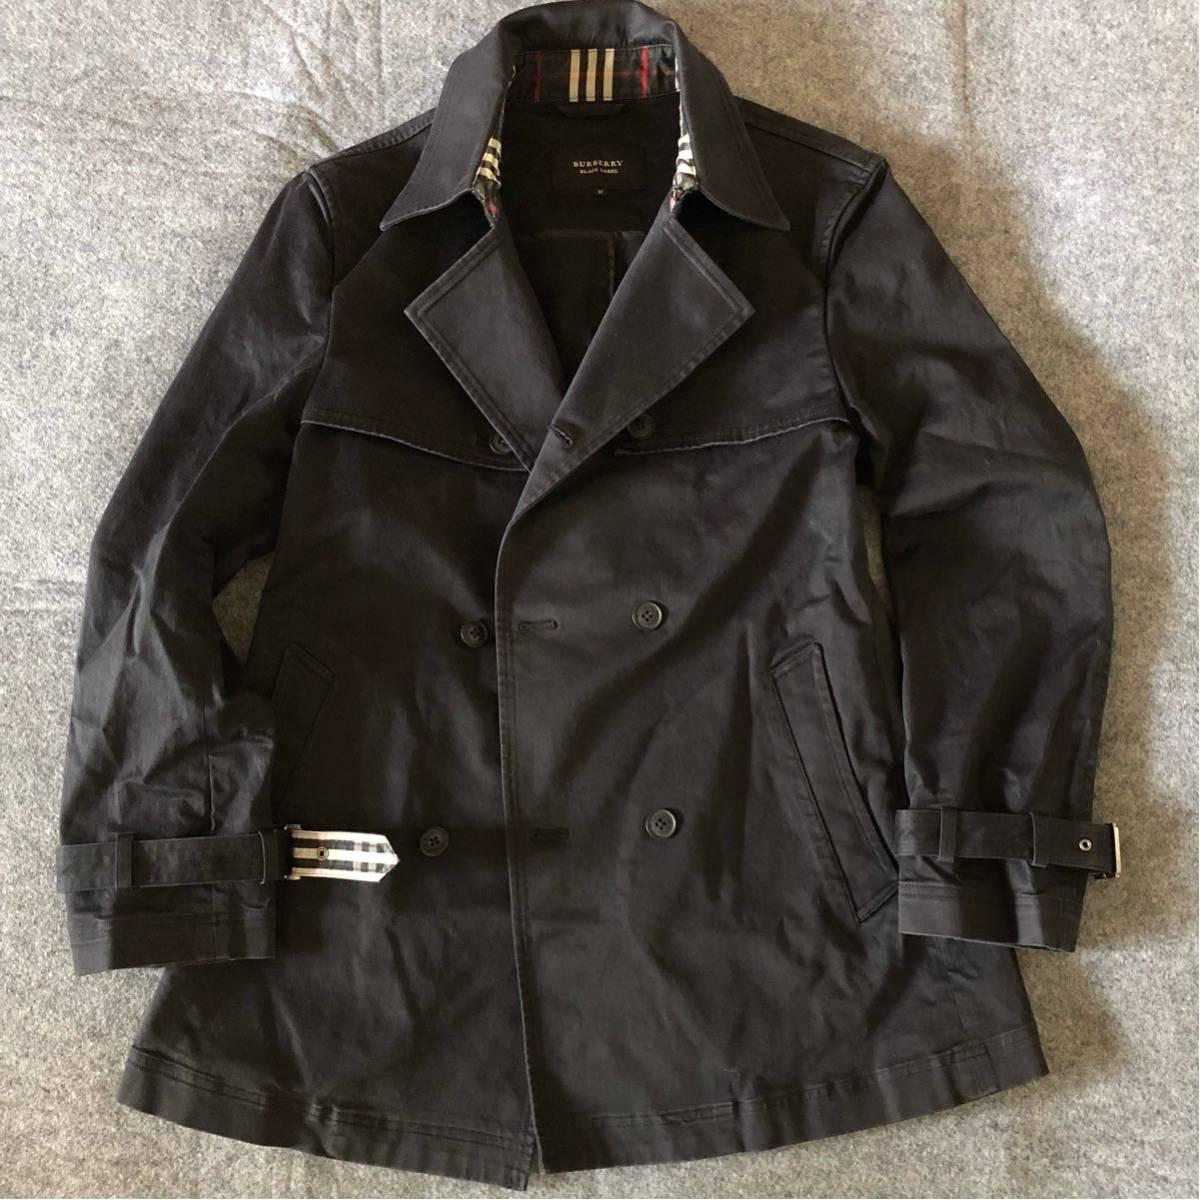 bbf282f7b68c66 美品 バーバリーブラックレーベル 春秋最適 Pコート ブラック サイズM BURBERRY BLACK LA